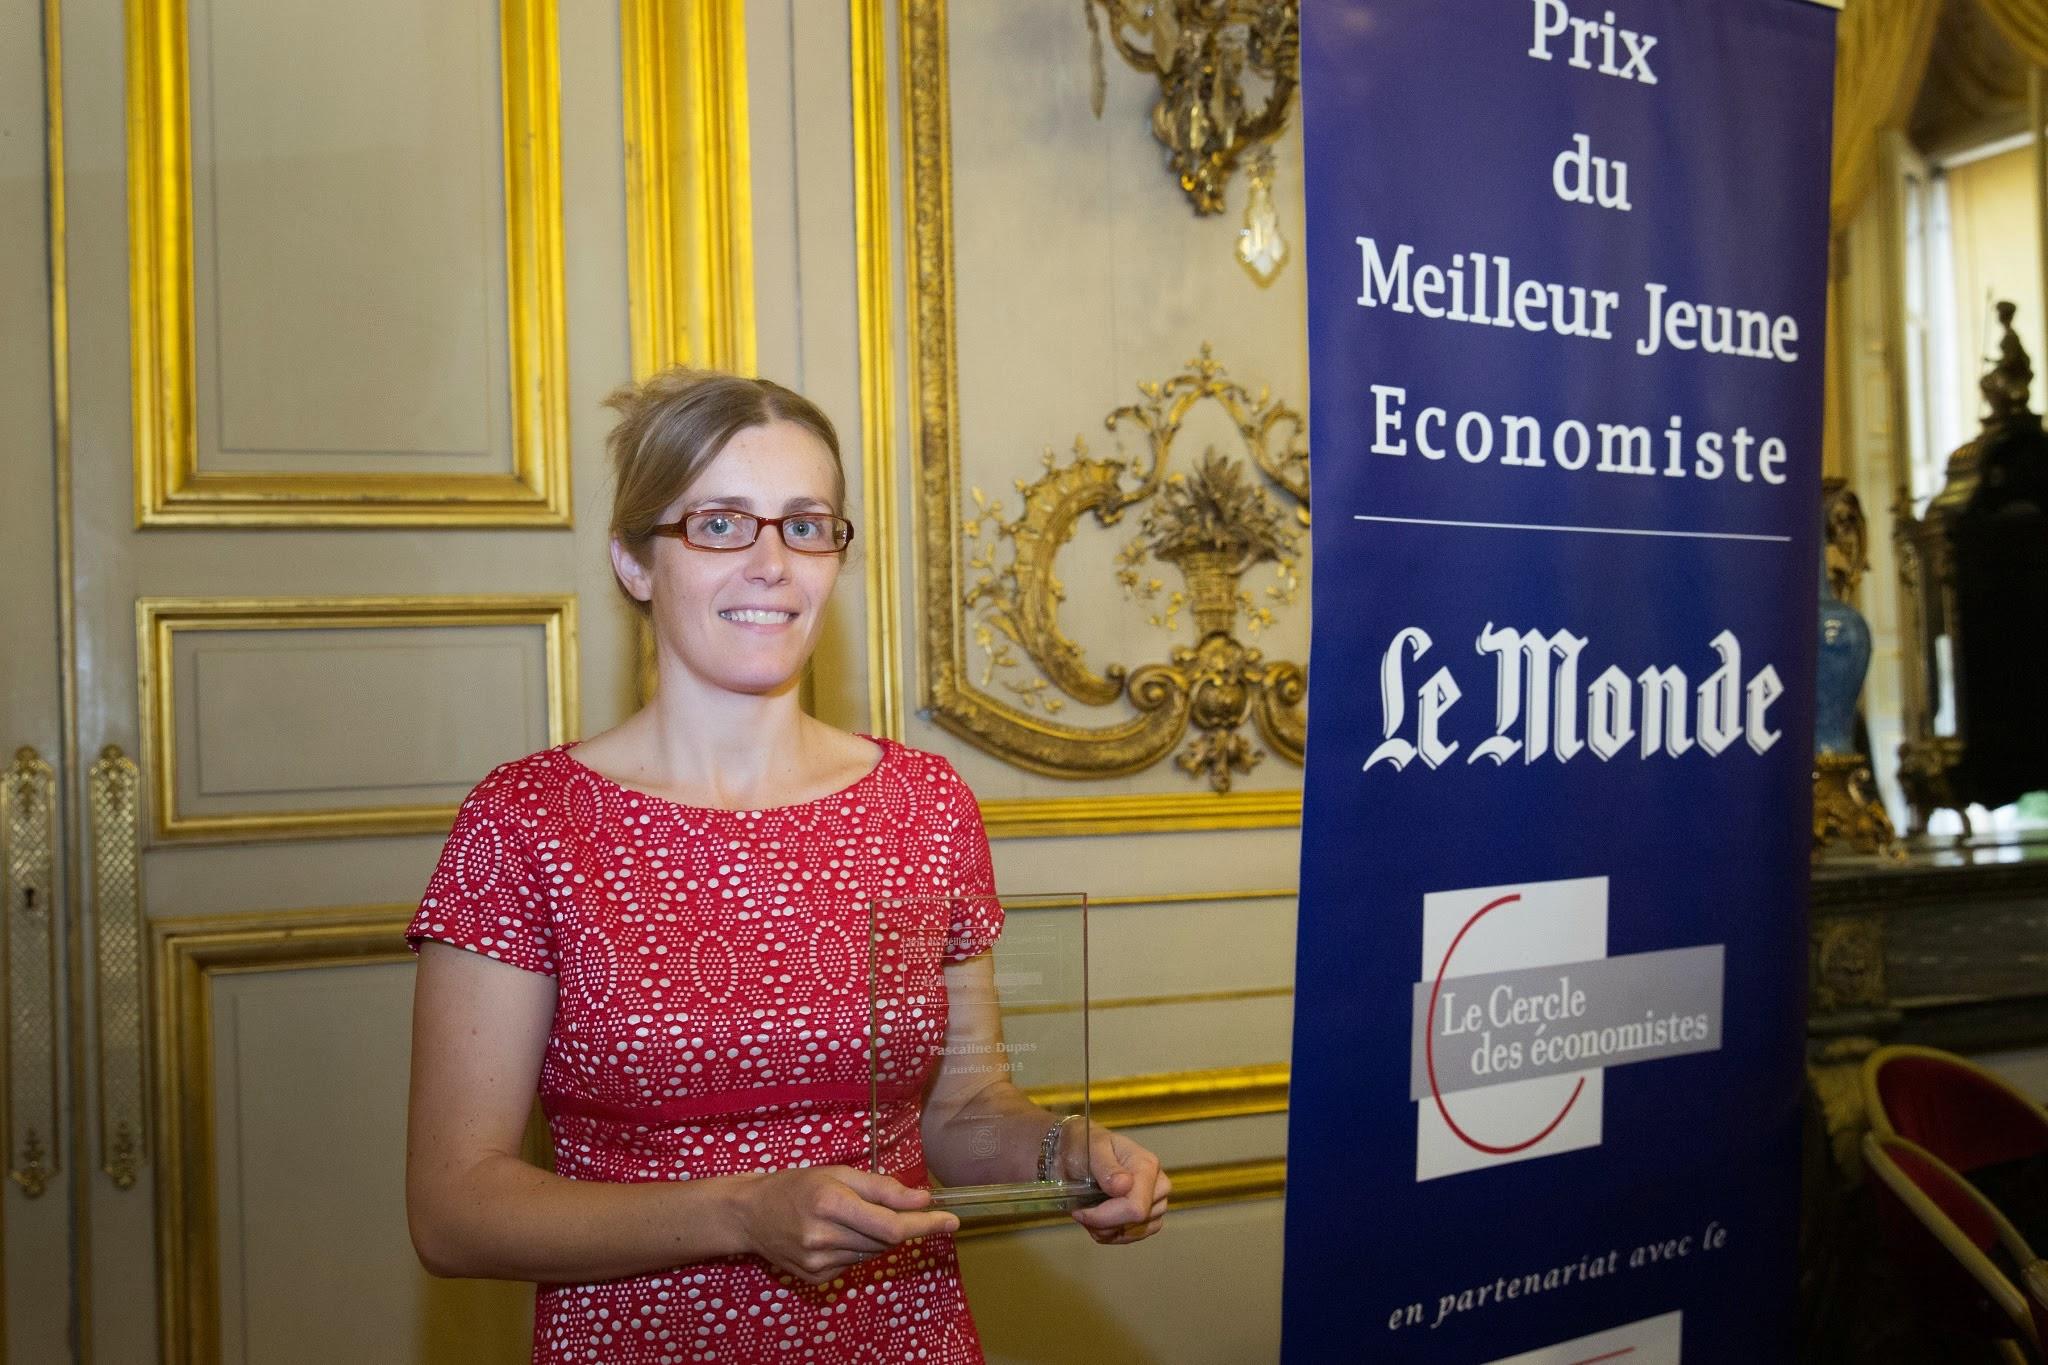 prix du meilleur jeune economiste 2015